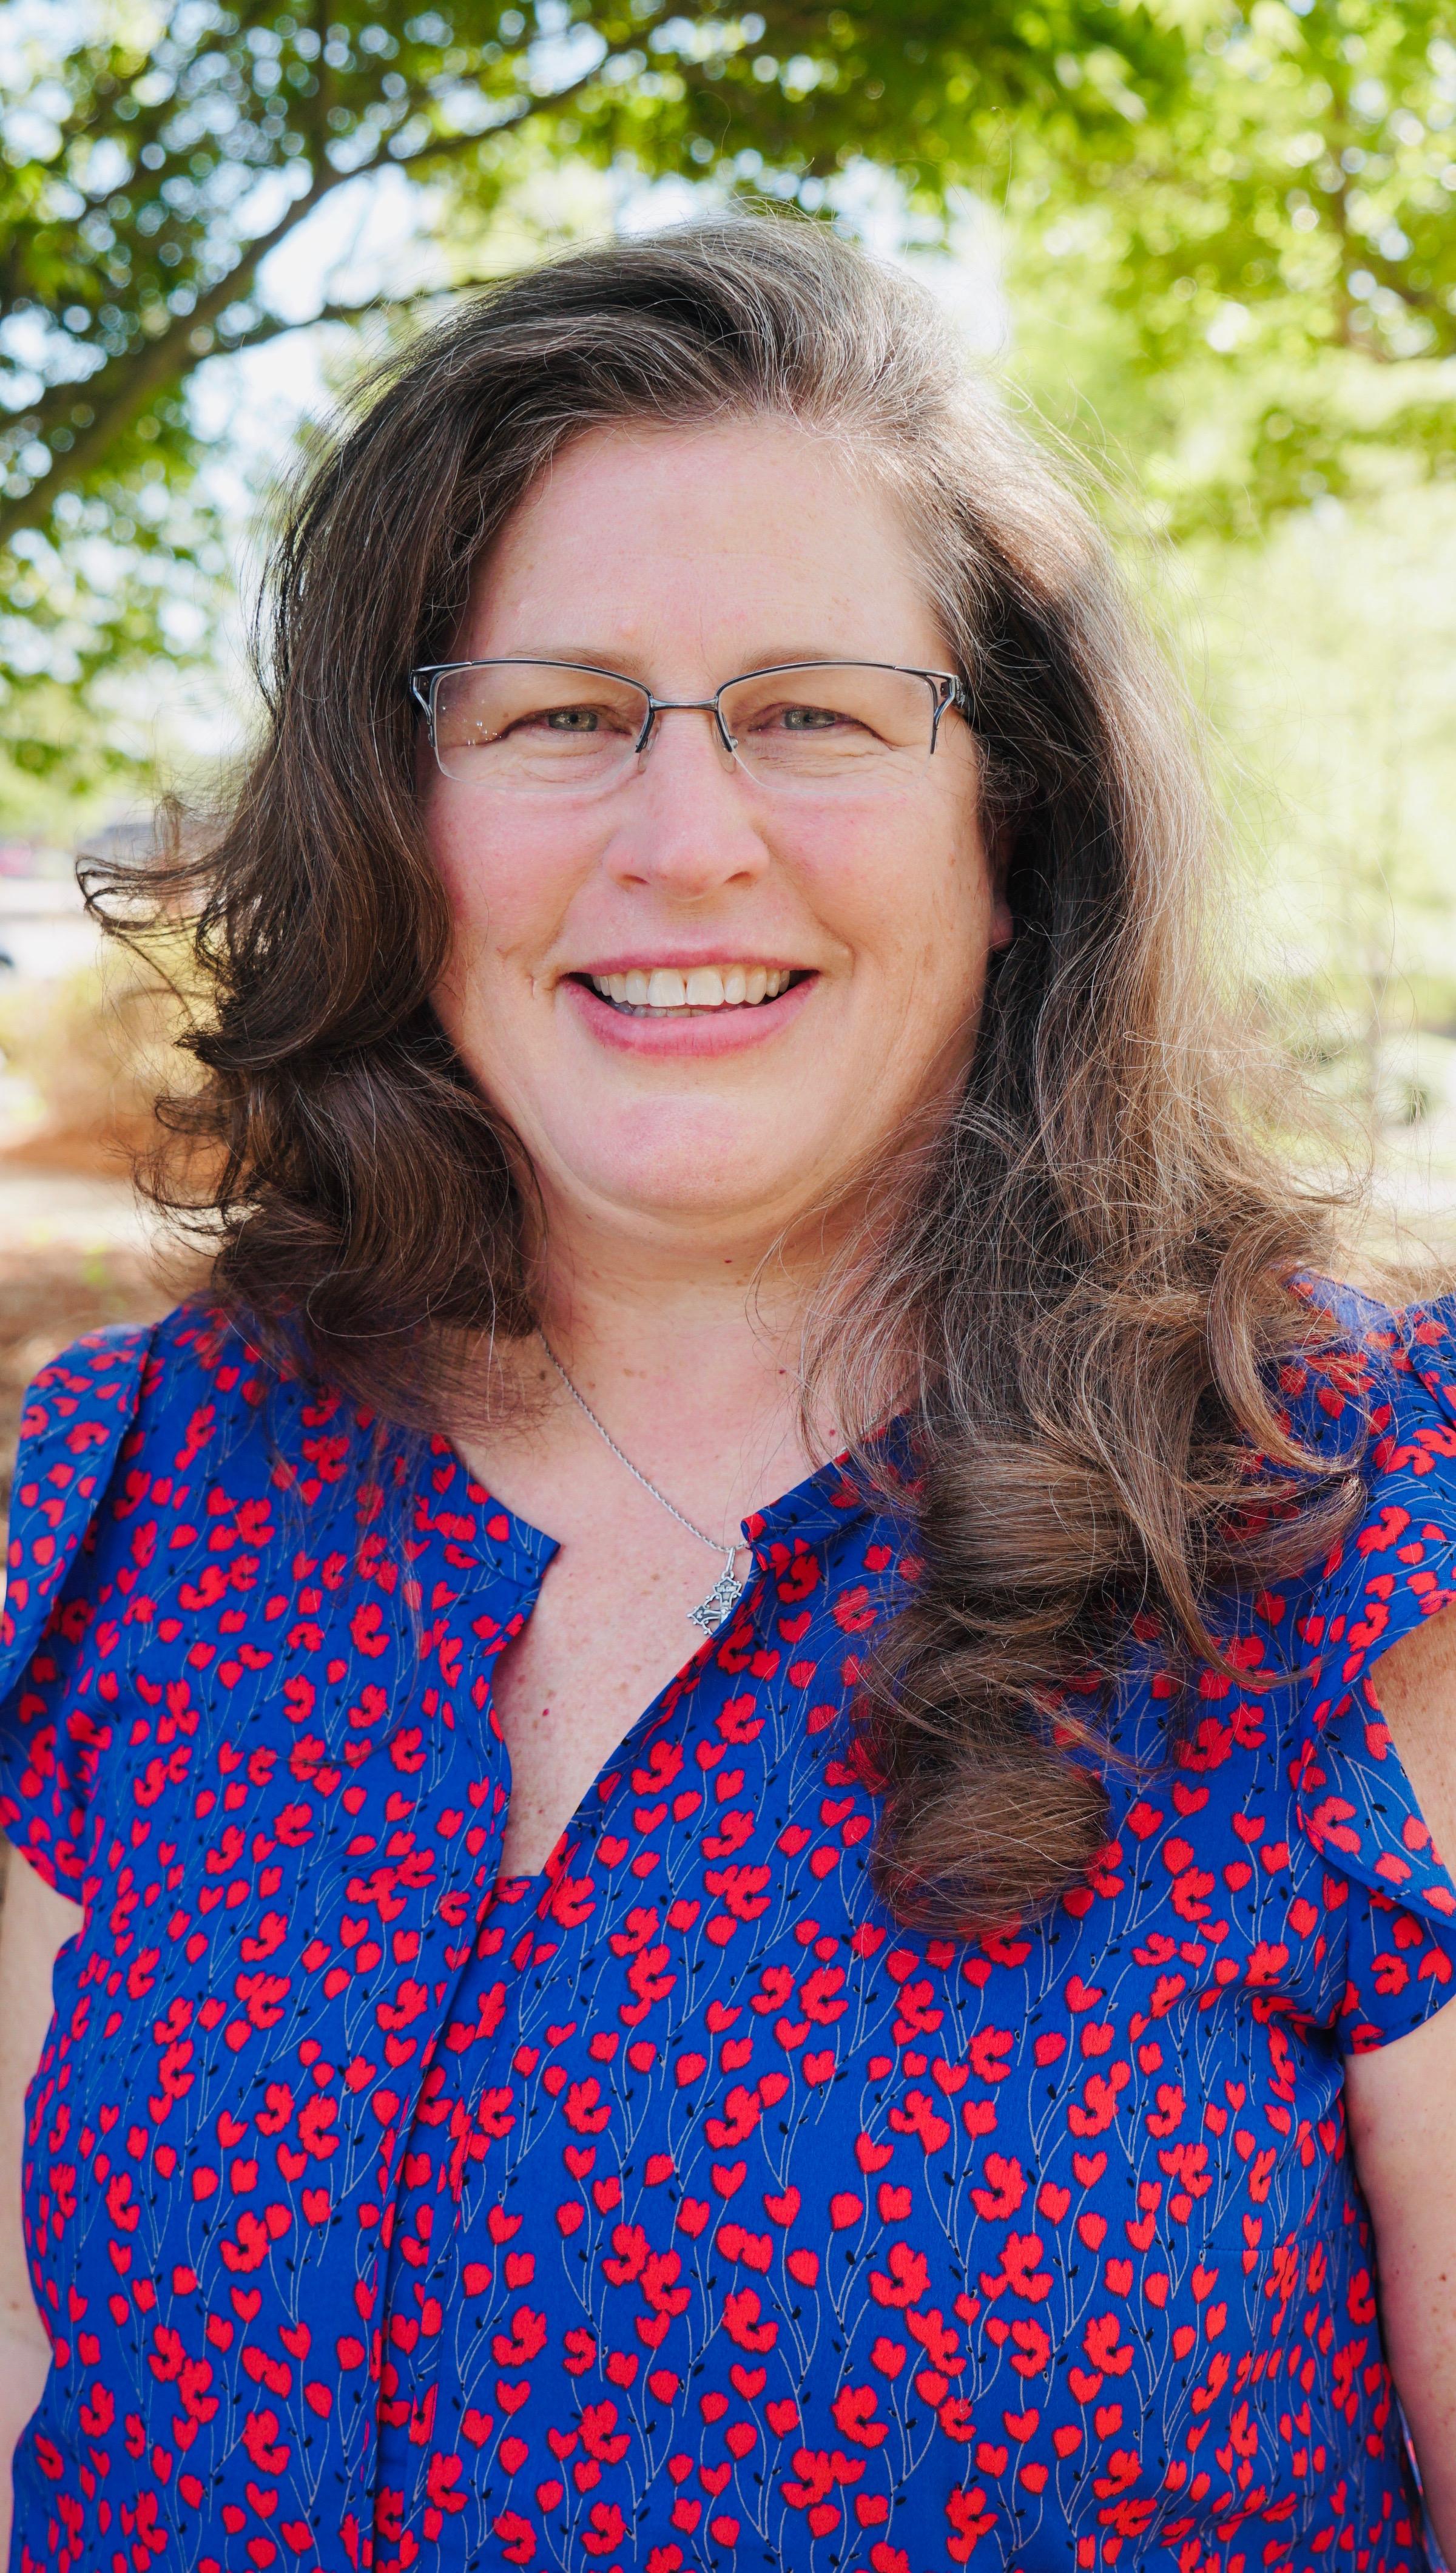 Chandler Ellis | President, Executive Director   - Wife, mom, grandmother, sister, aunt - Mentor - Innovator